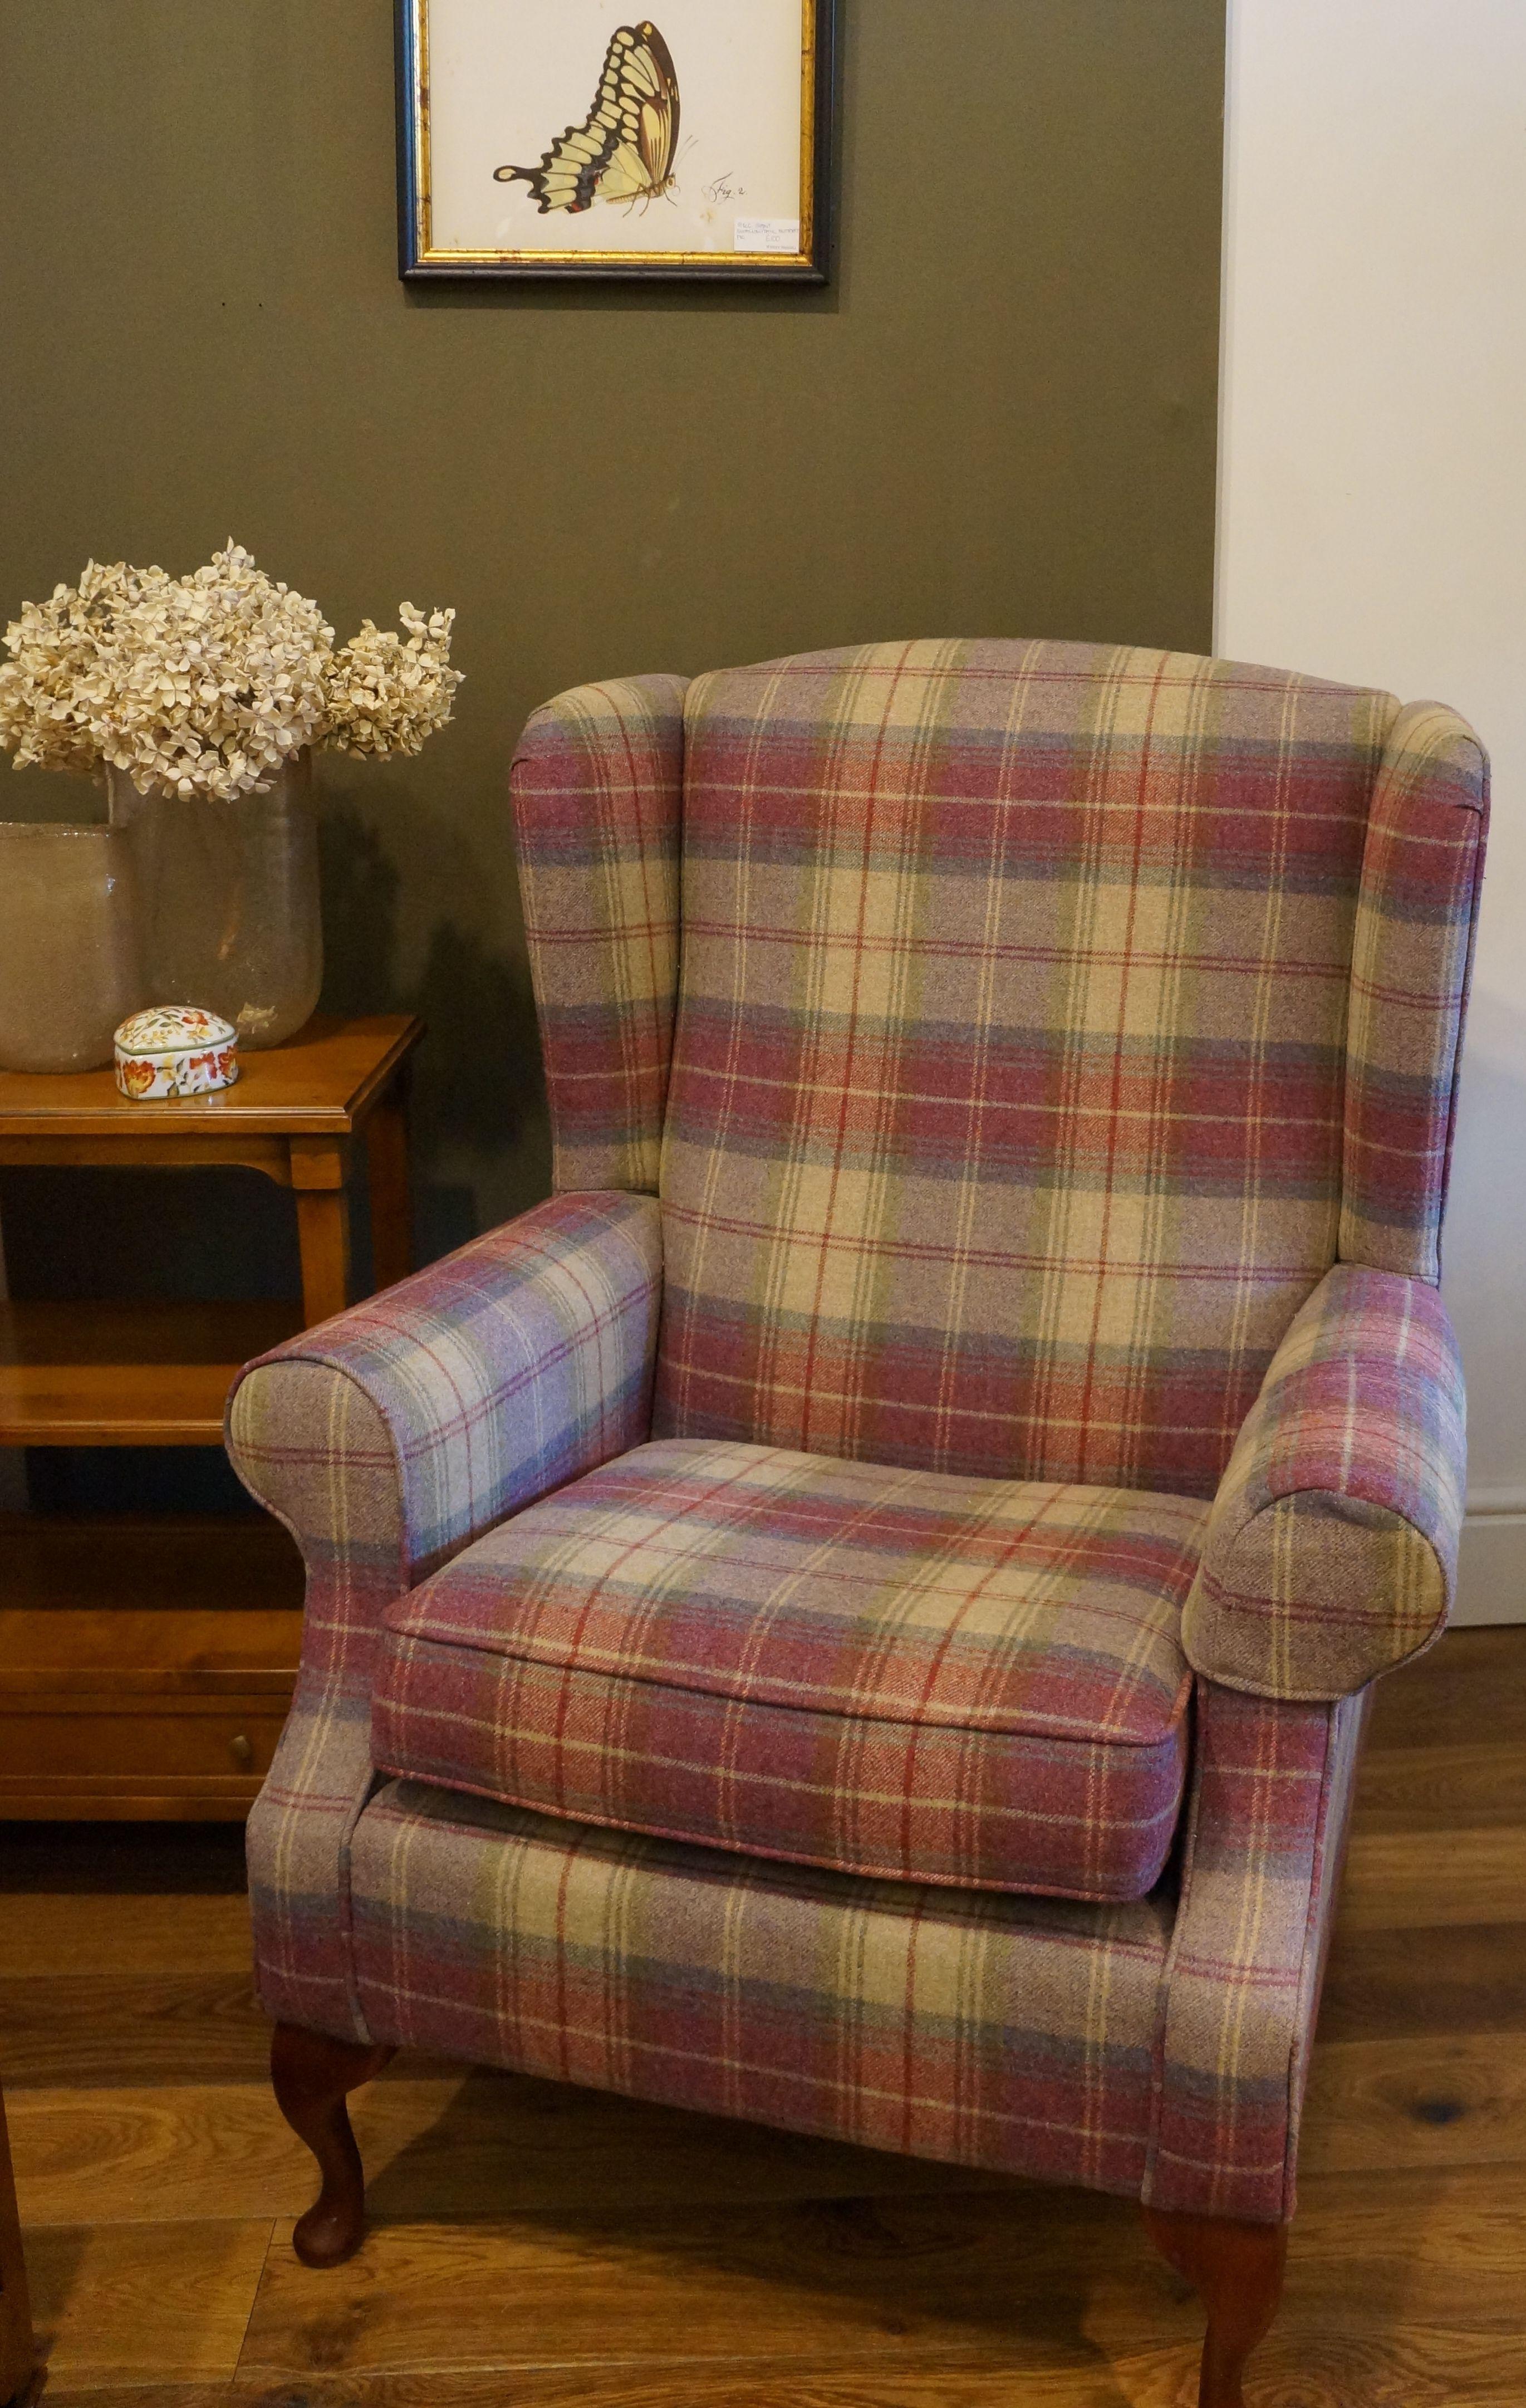 Blenheim wing back chair in Sanderson Highlands plaid